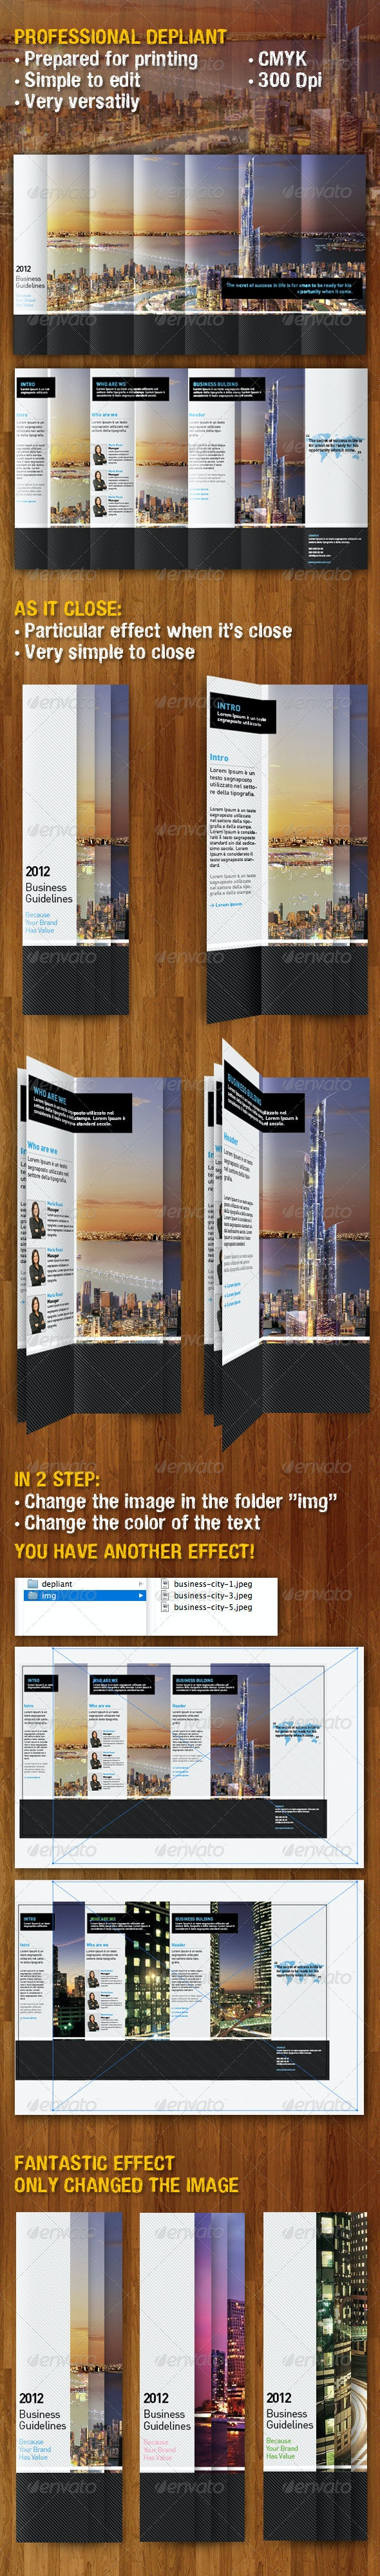 PROFESSIONAL DEPLIANT TEMPLATE - Informational Brochures